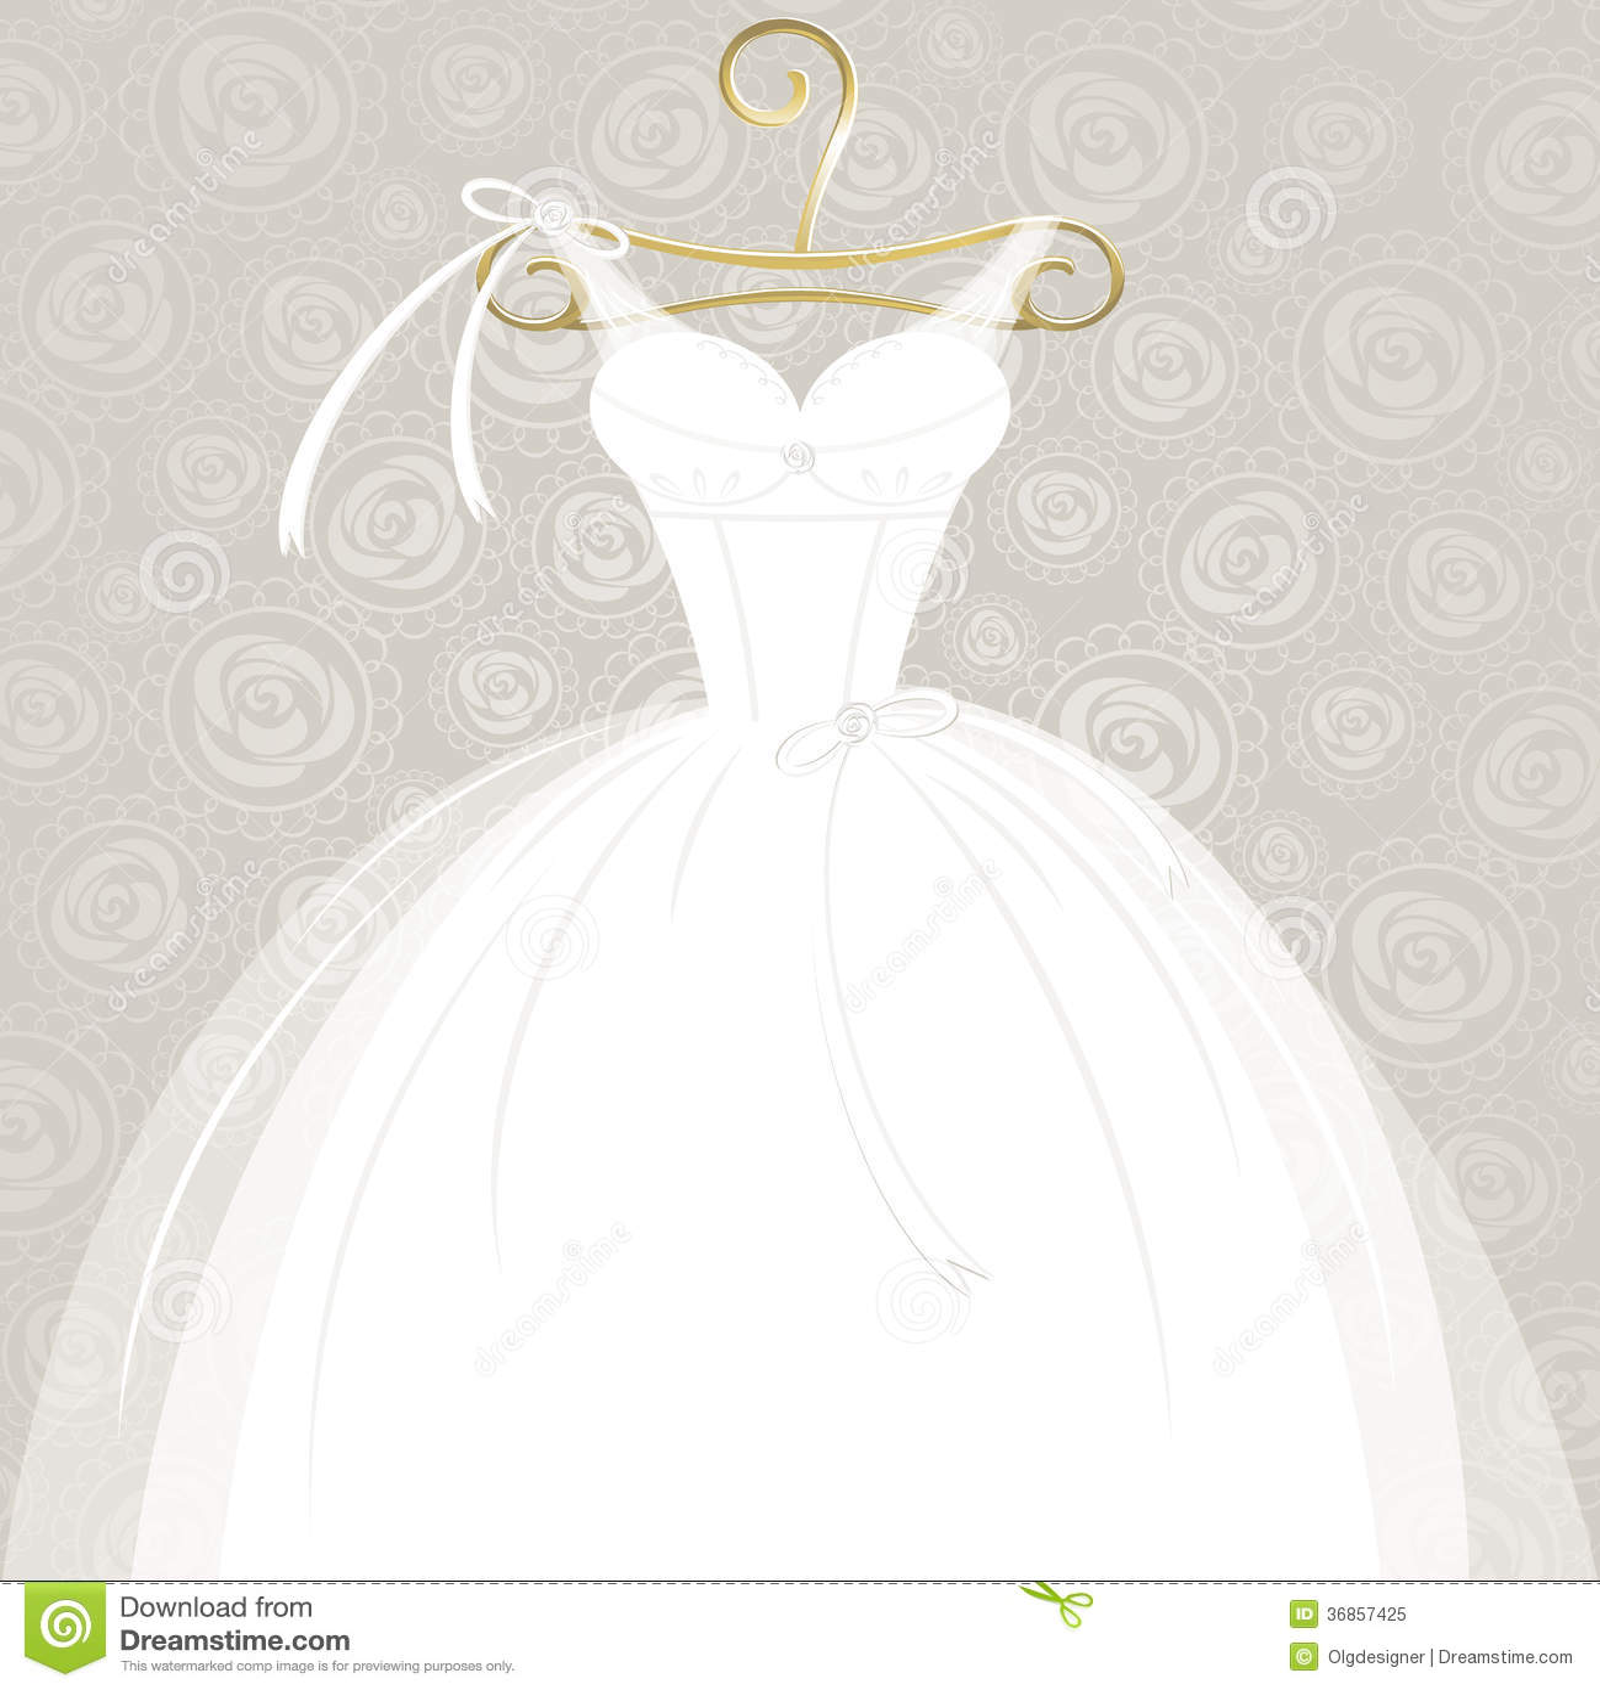 White Wedding Gown Royalty Free Stock Photo Image 36857425